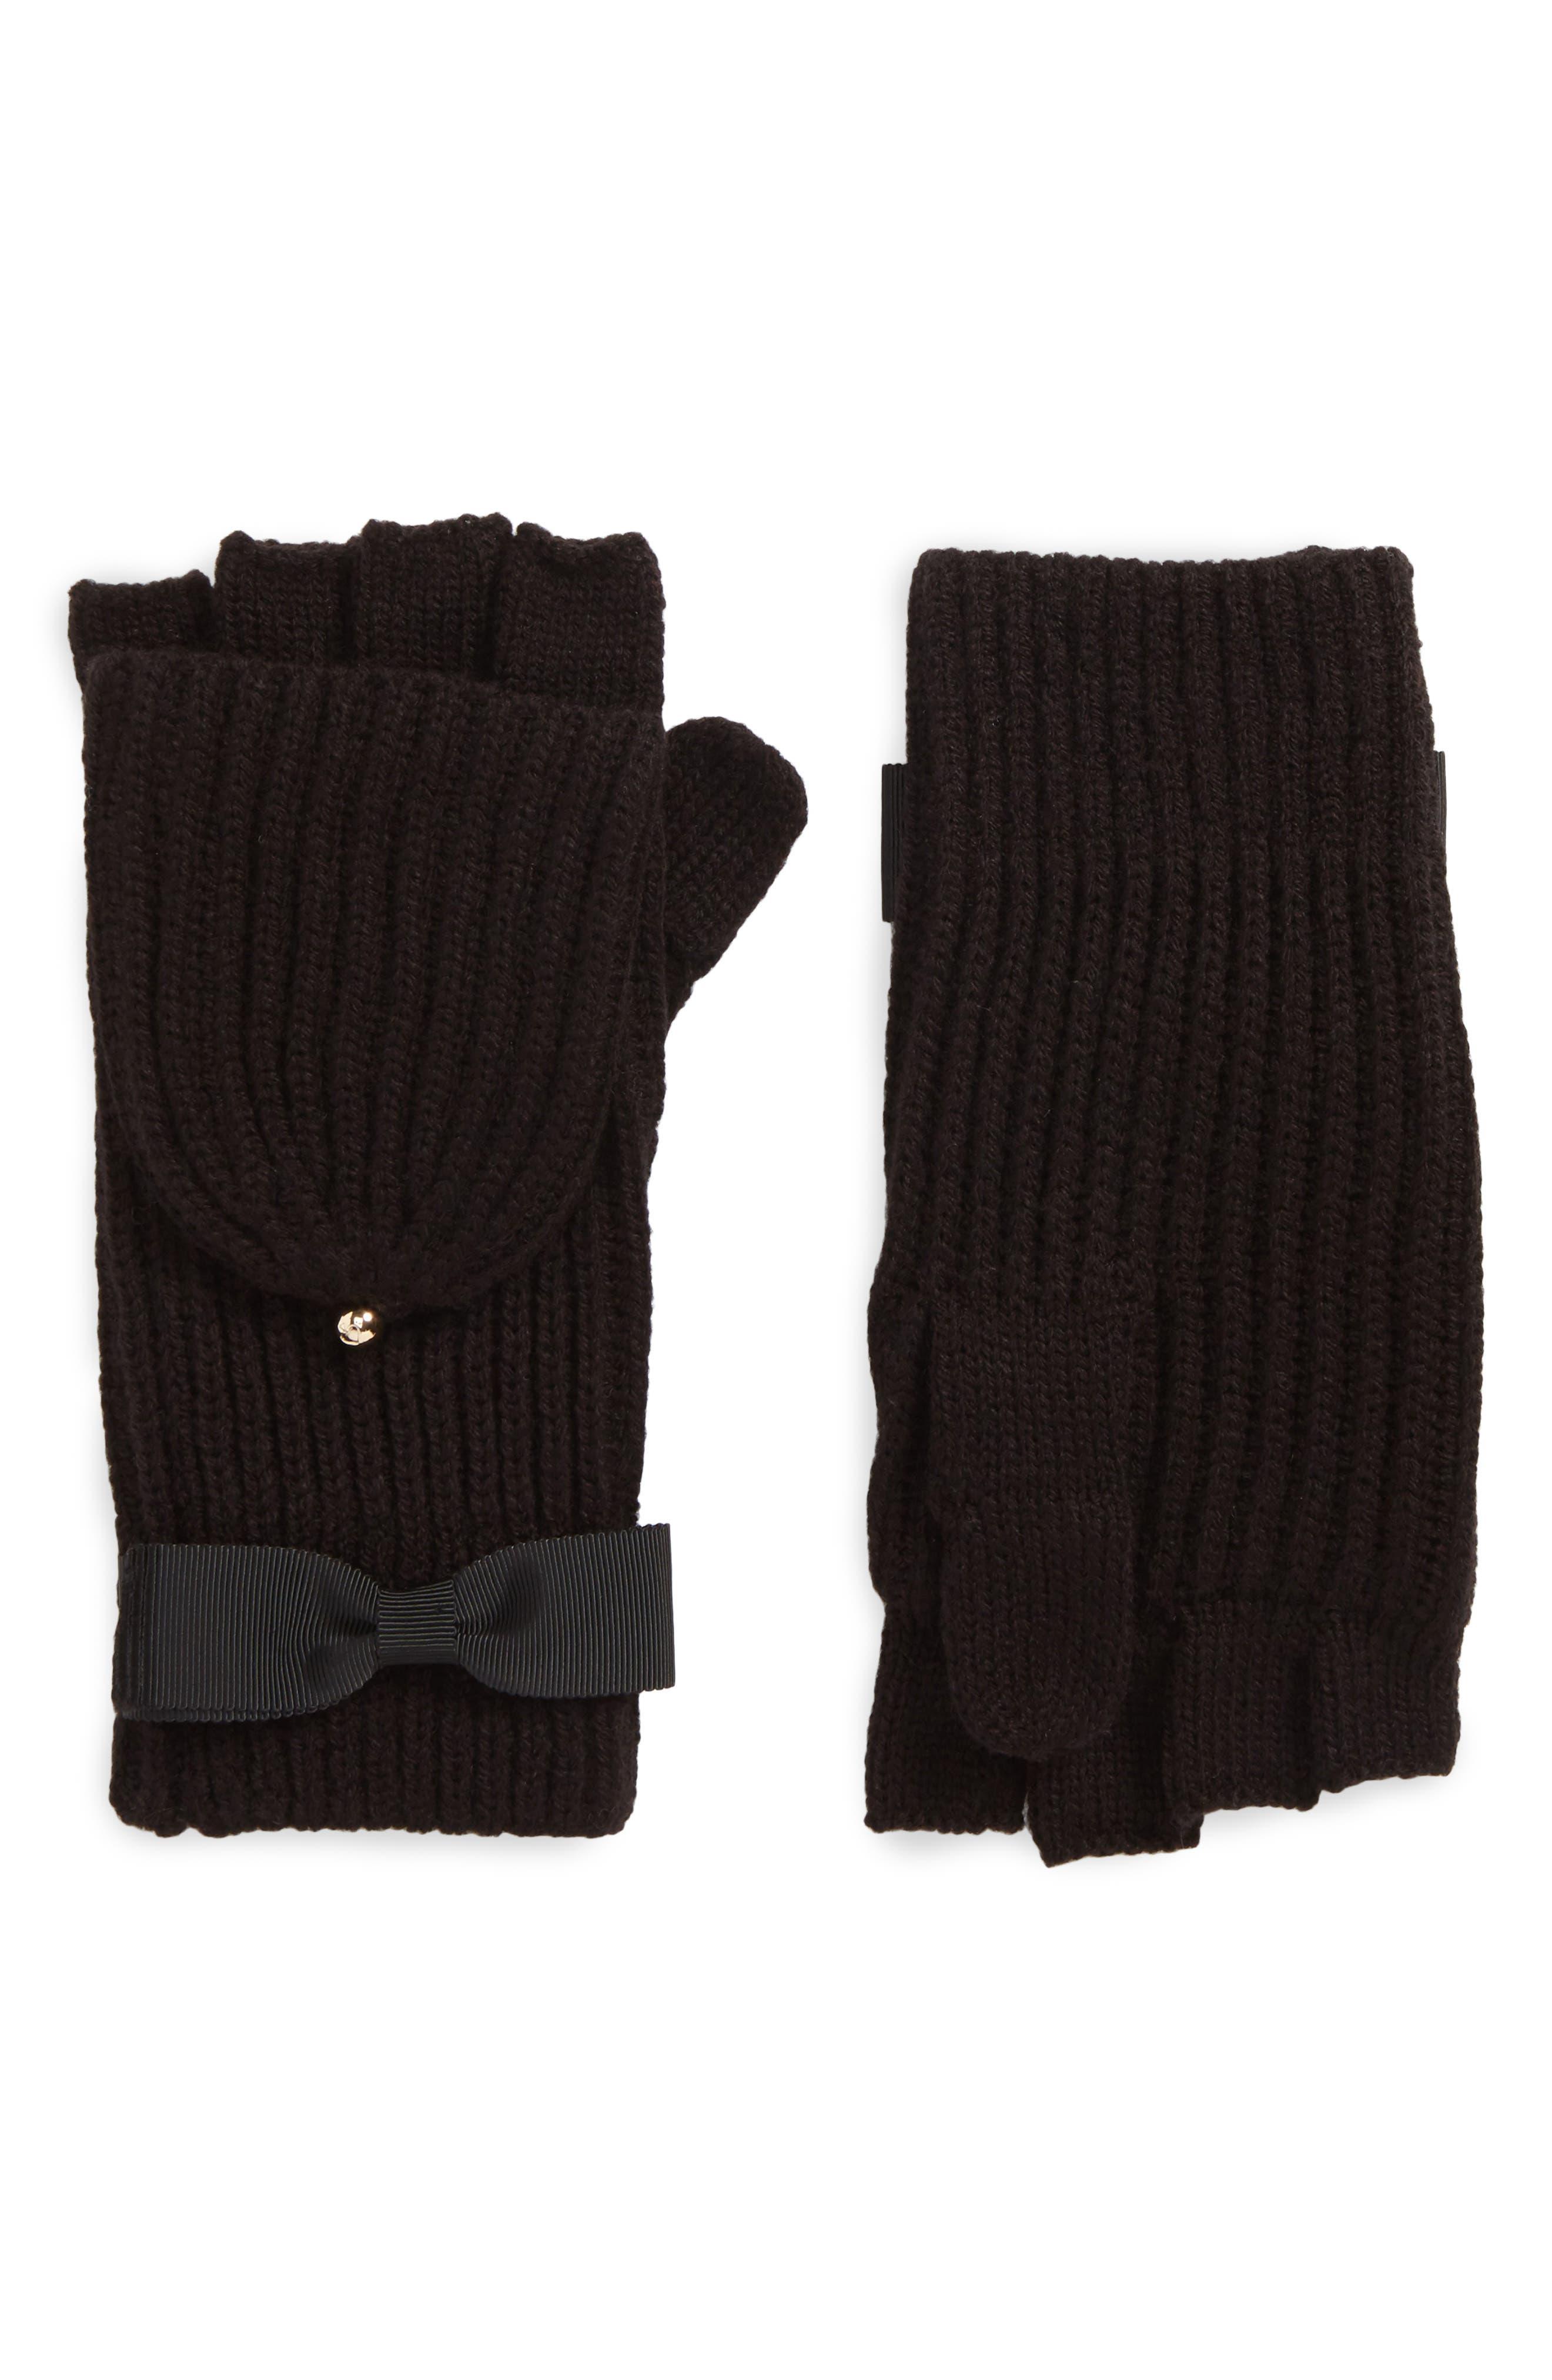 kate spade new york grosgrain bow convertible knit mittens